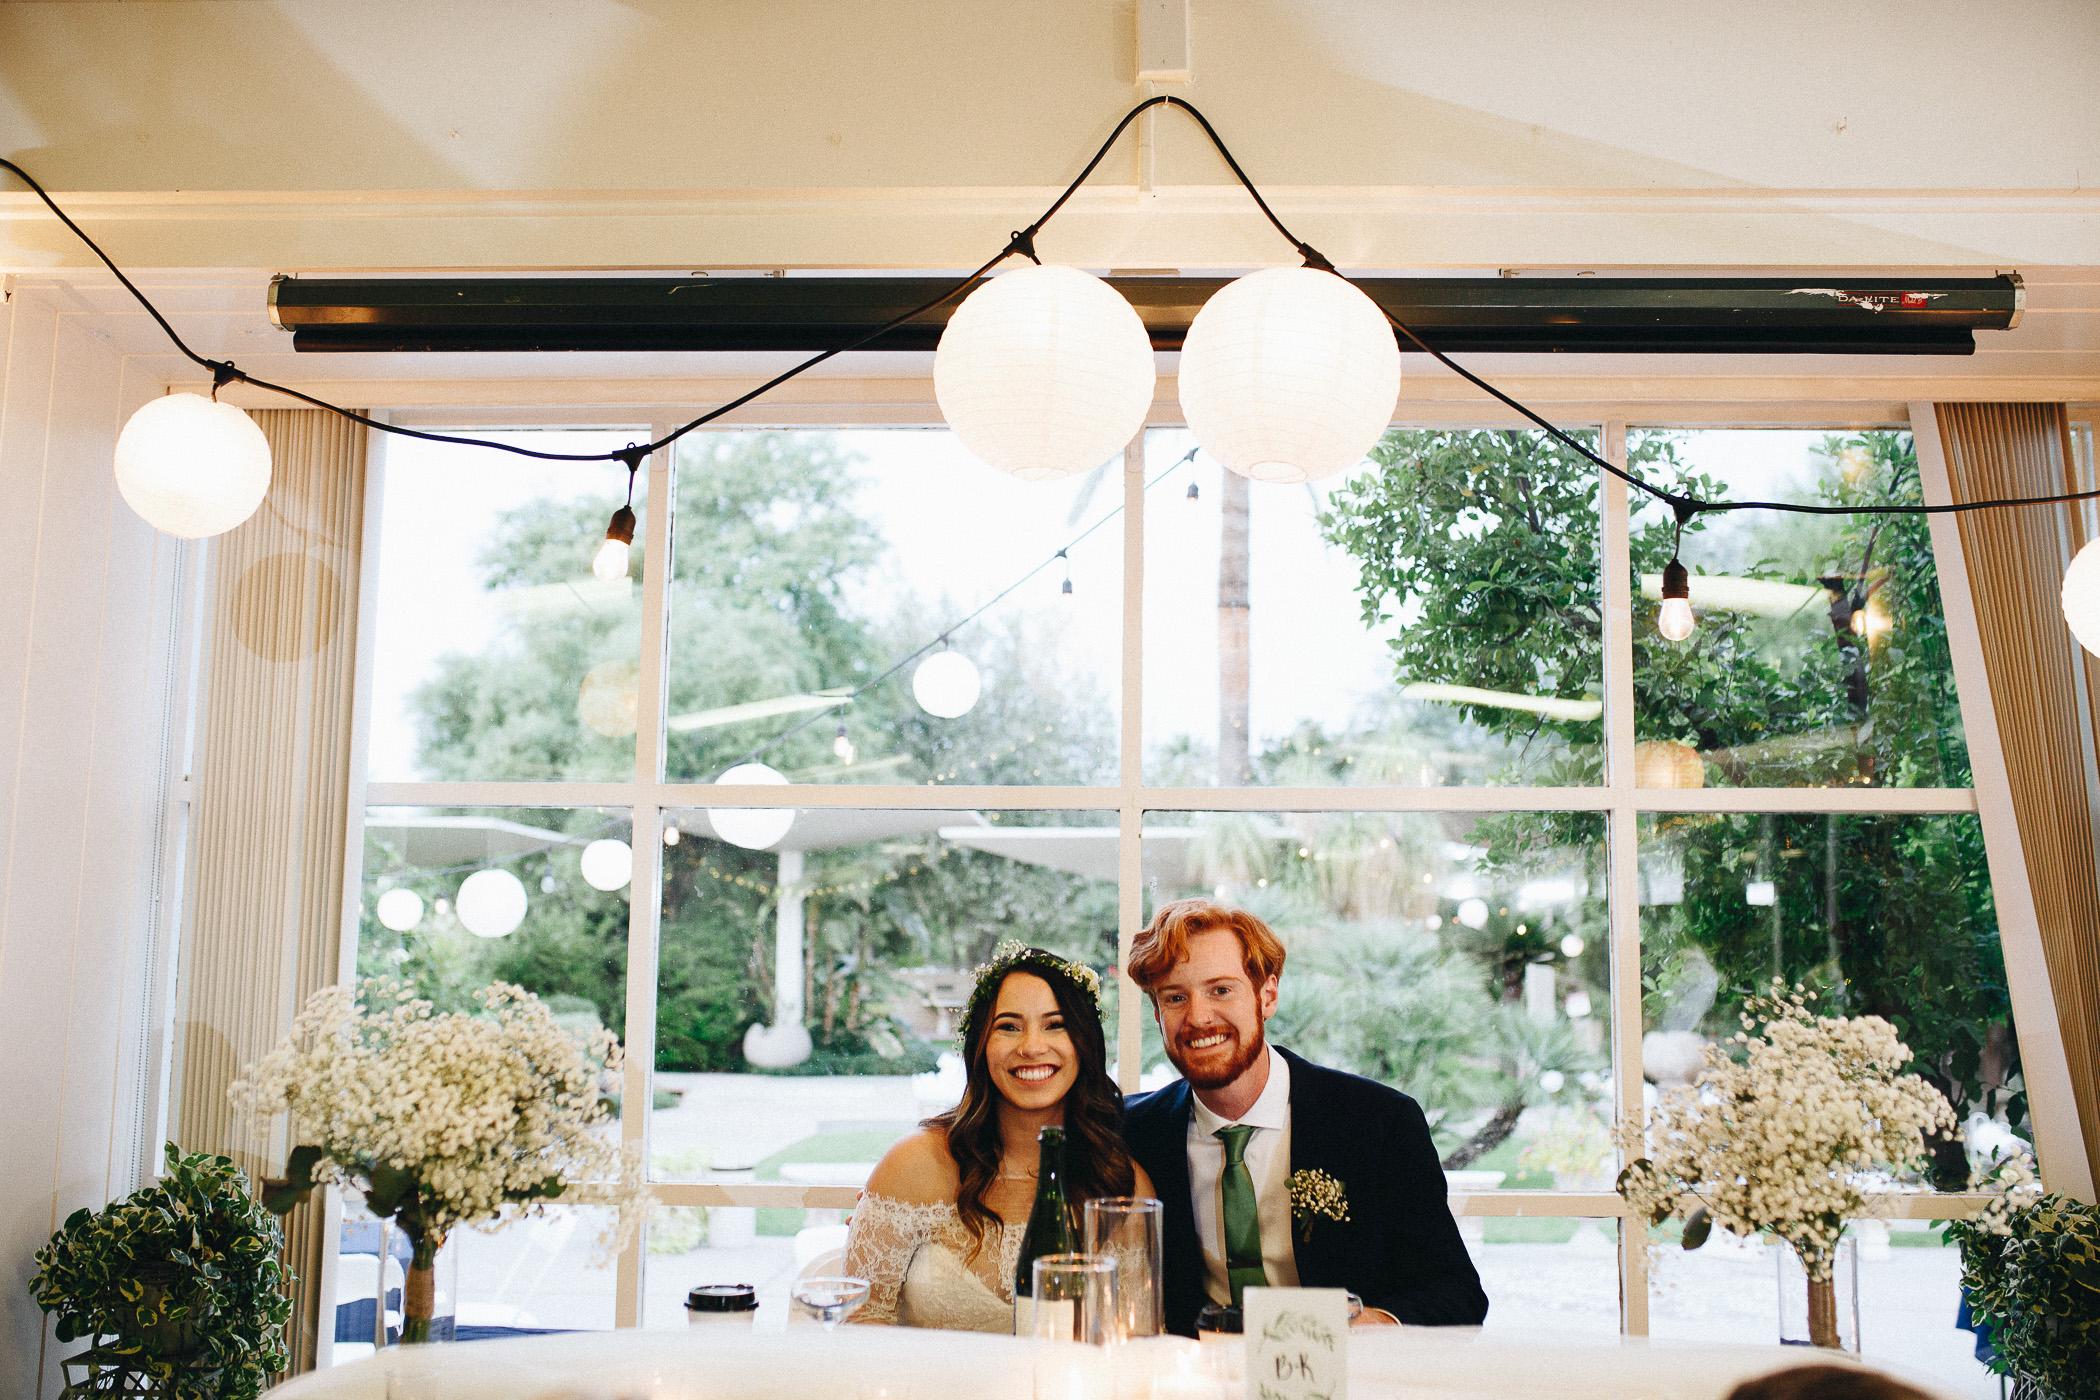 181104-Luxium-Weddings-Arizona-@matt__Le-Brandon-Kariana-Phoenix-Valley-Garden-Center-1120.jpg